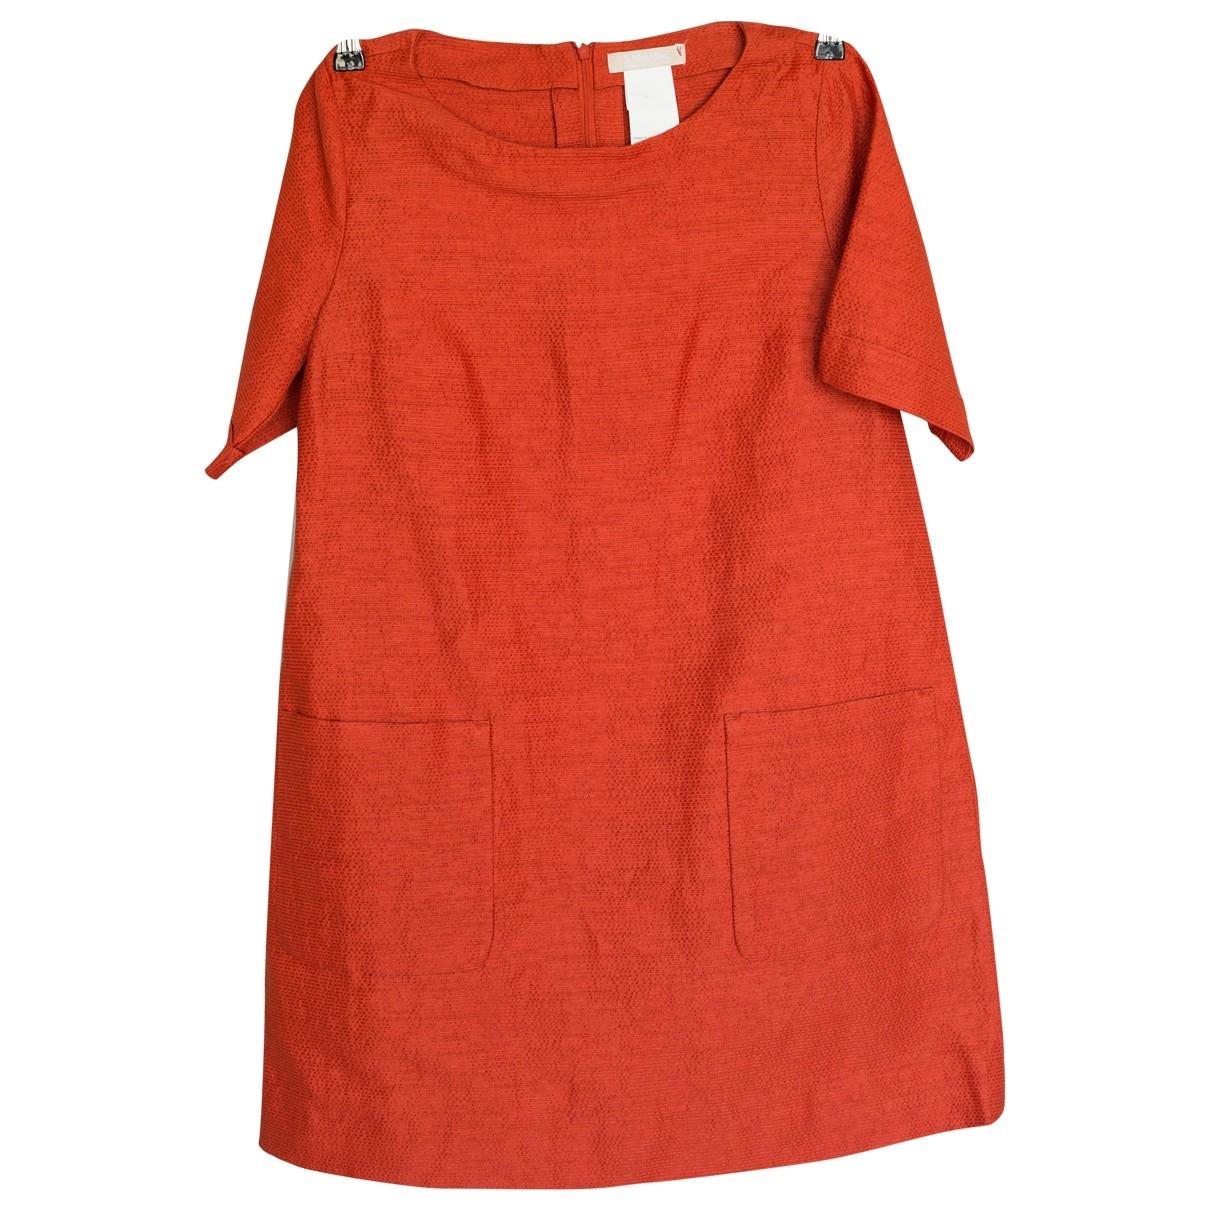 Max Mara s \N Orange Cotton dress for Women 44 IT